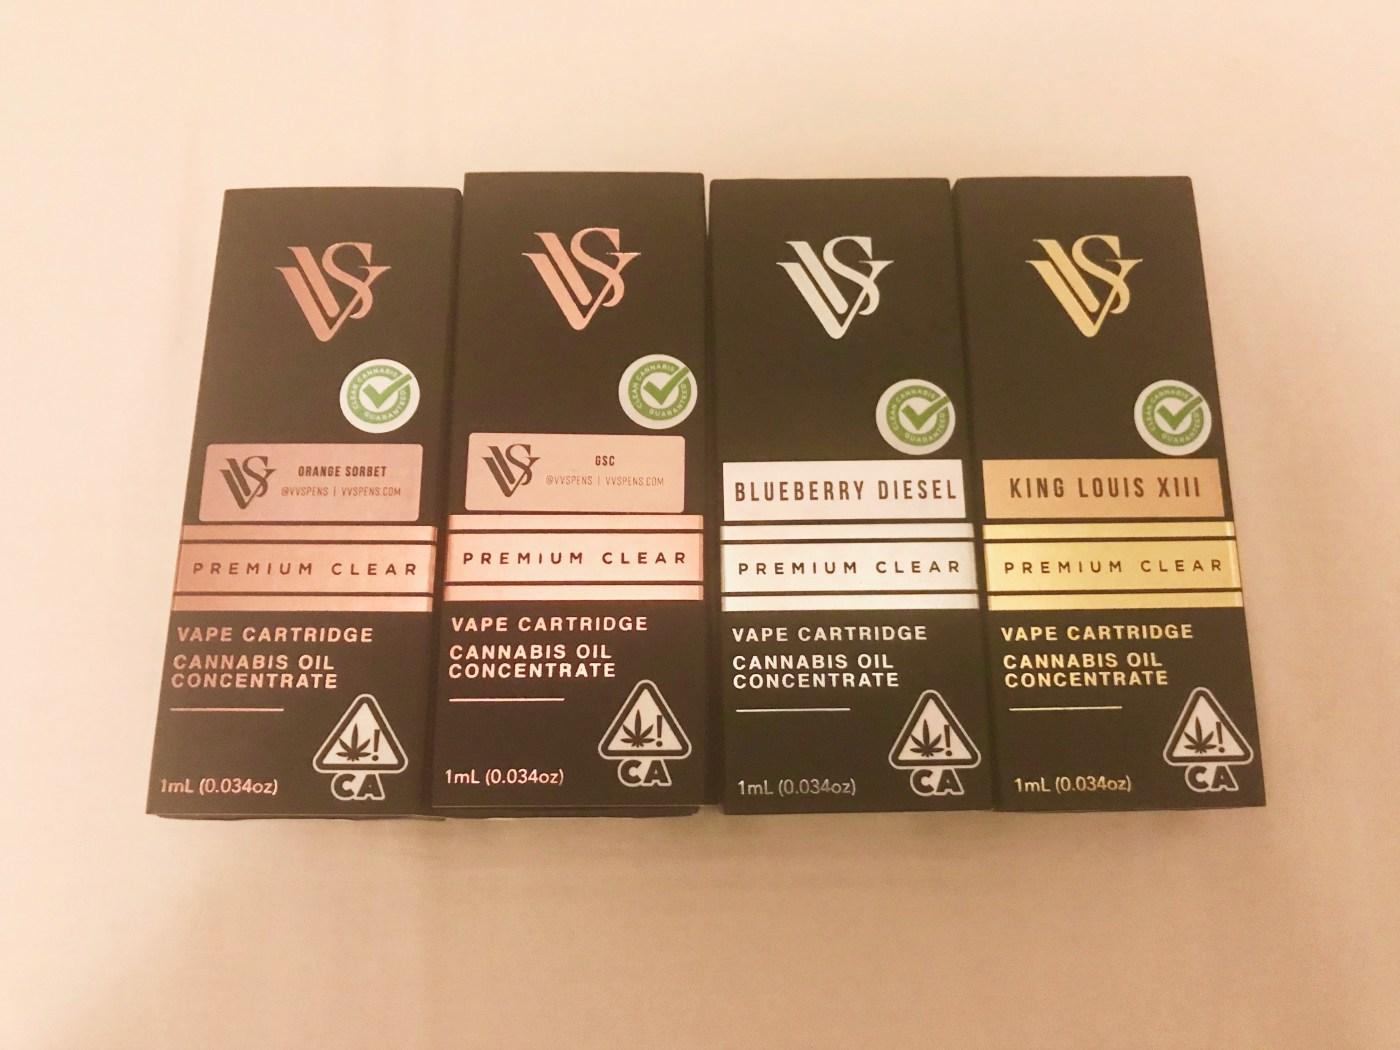 VVS premium clear vape cartridge with cannabis oil concentrate